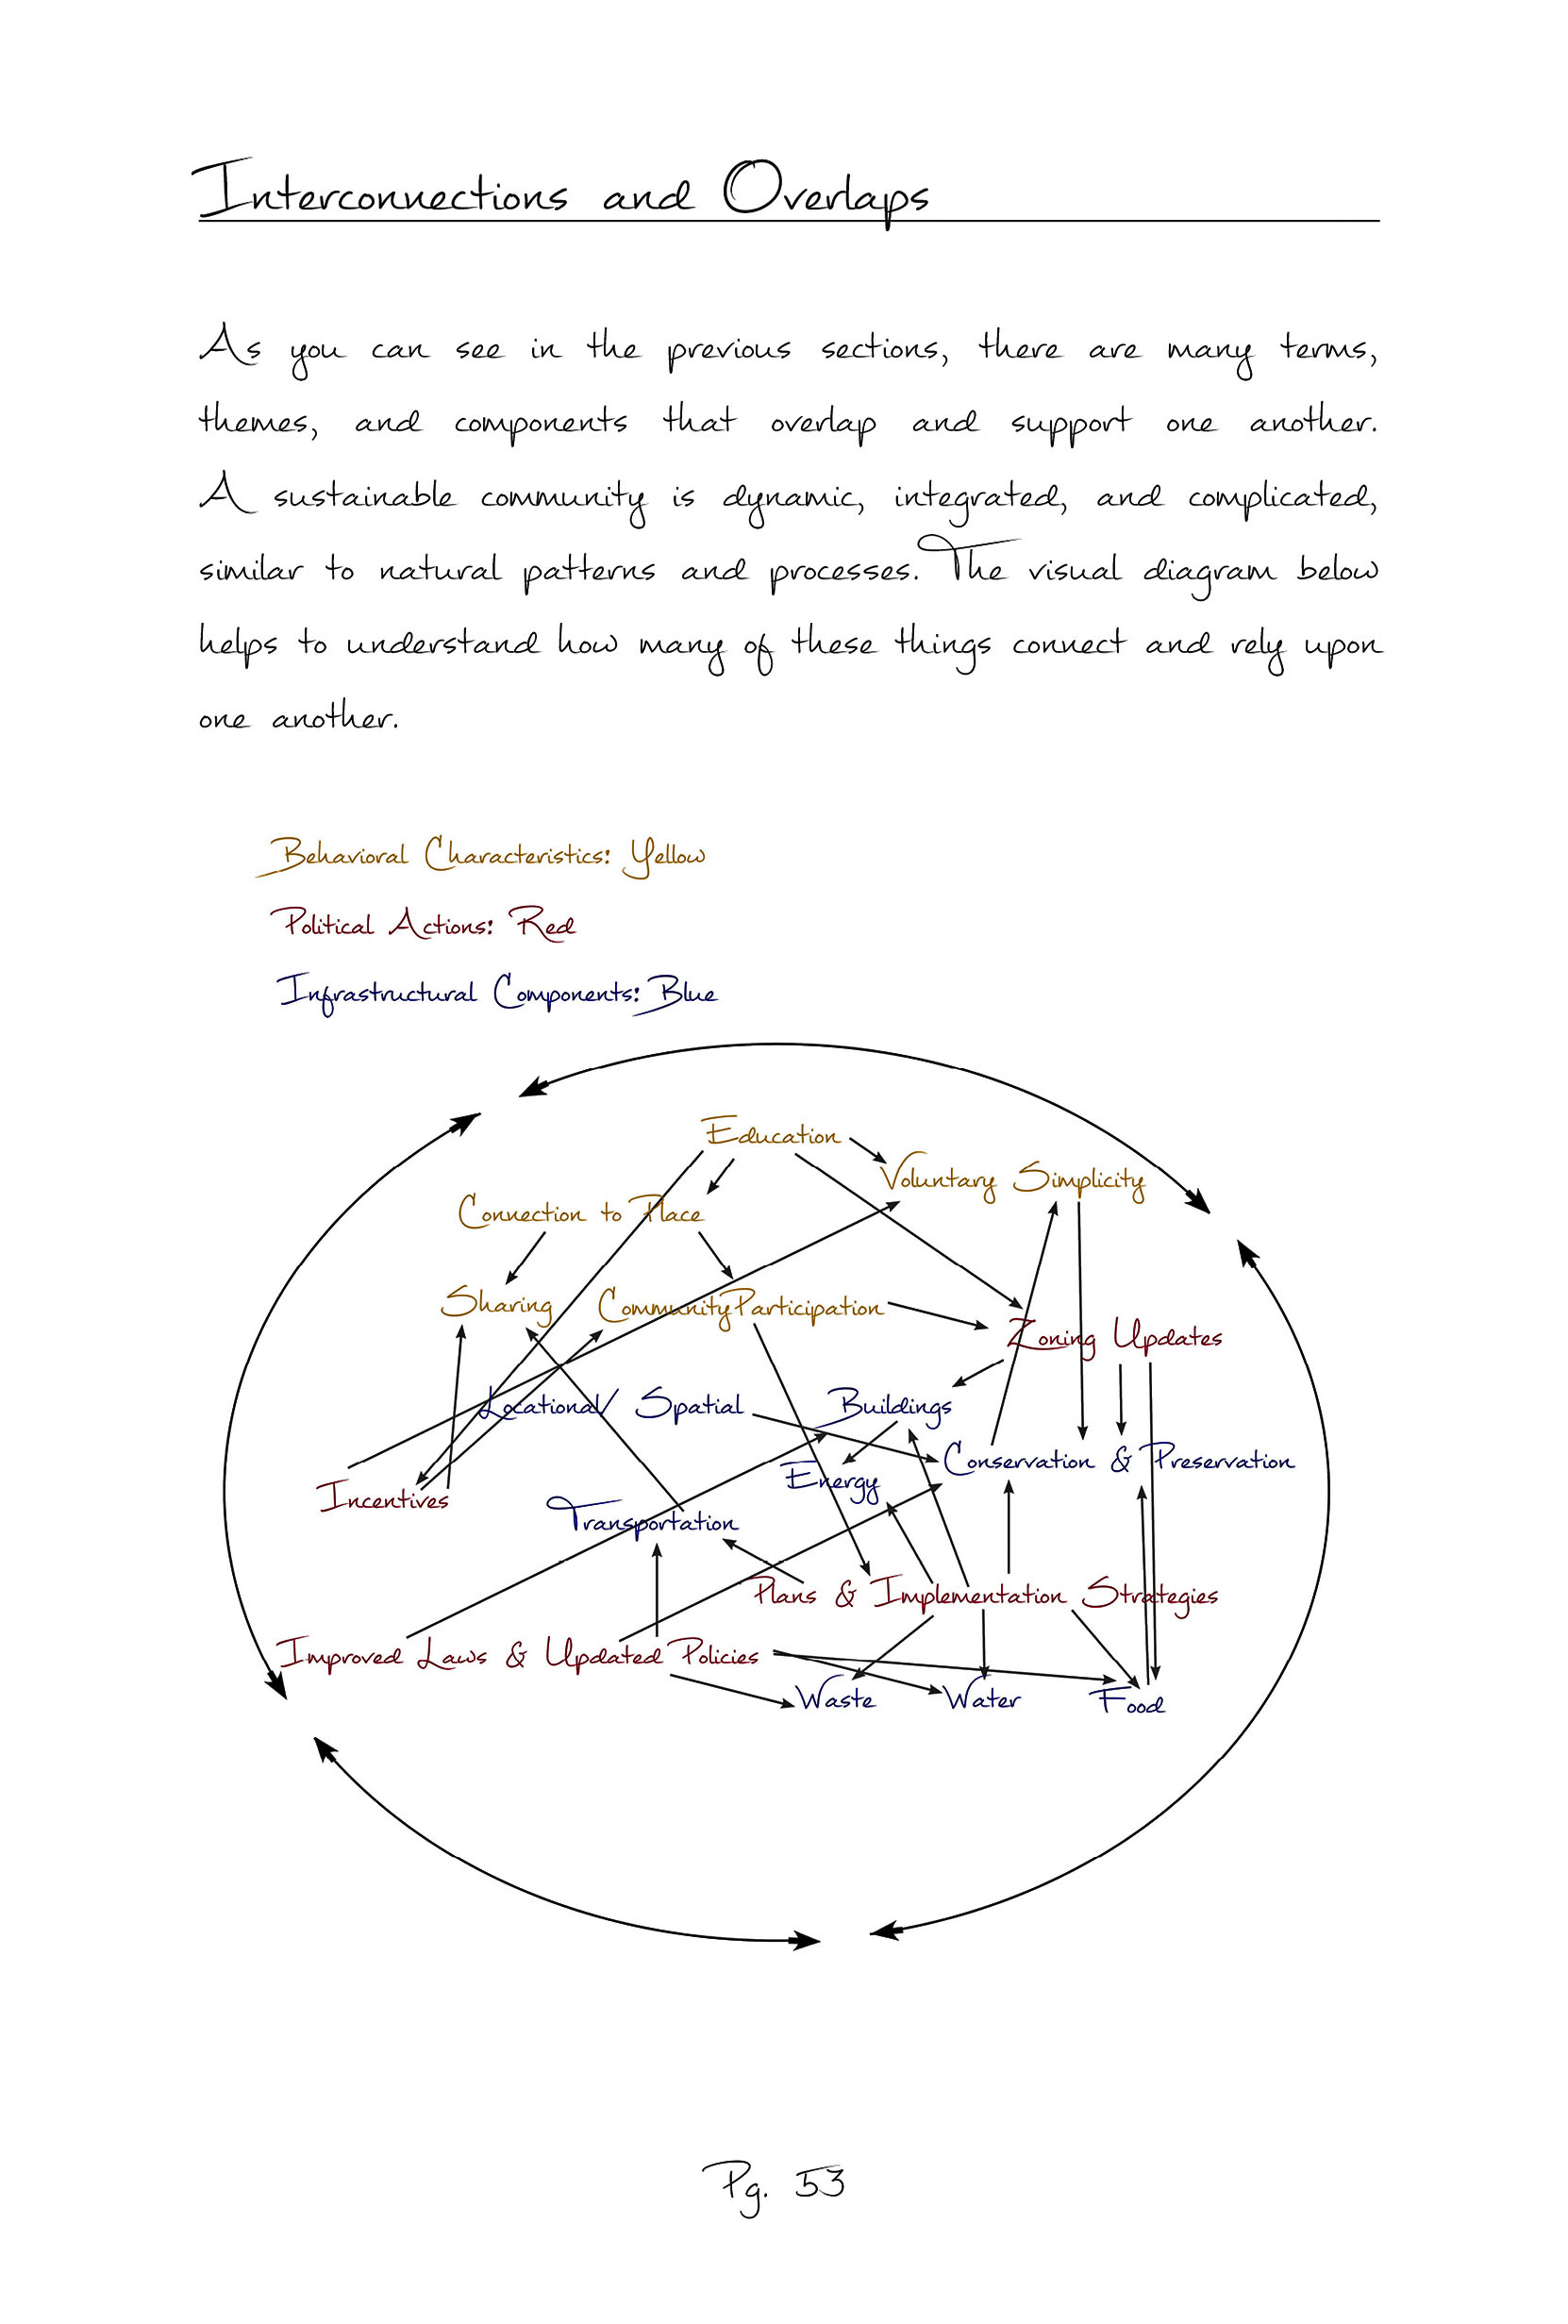 Interconnections & Overlaps